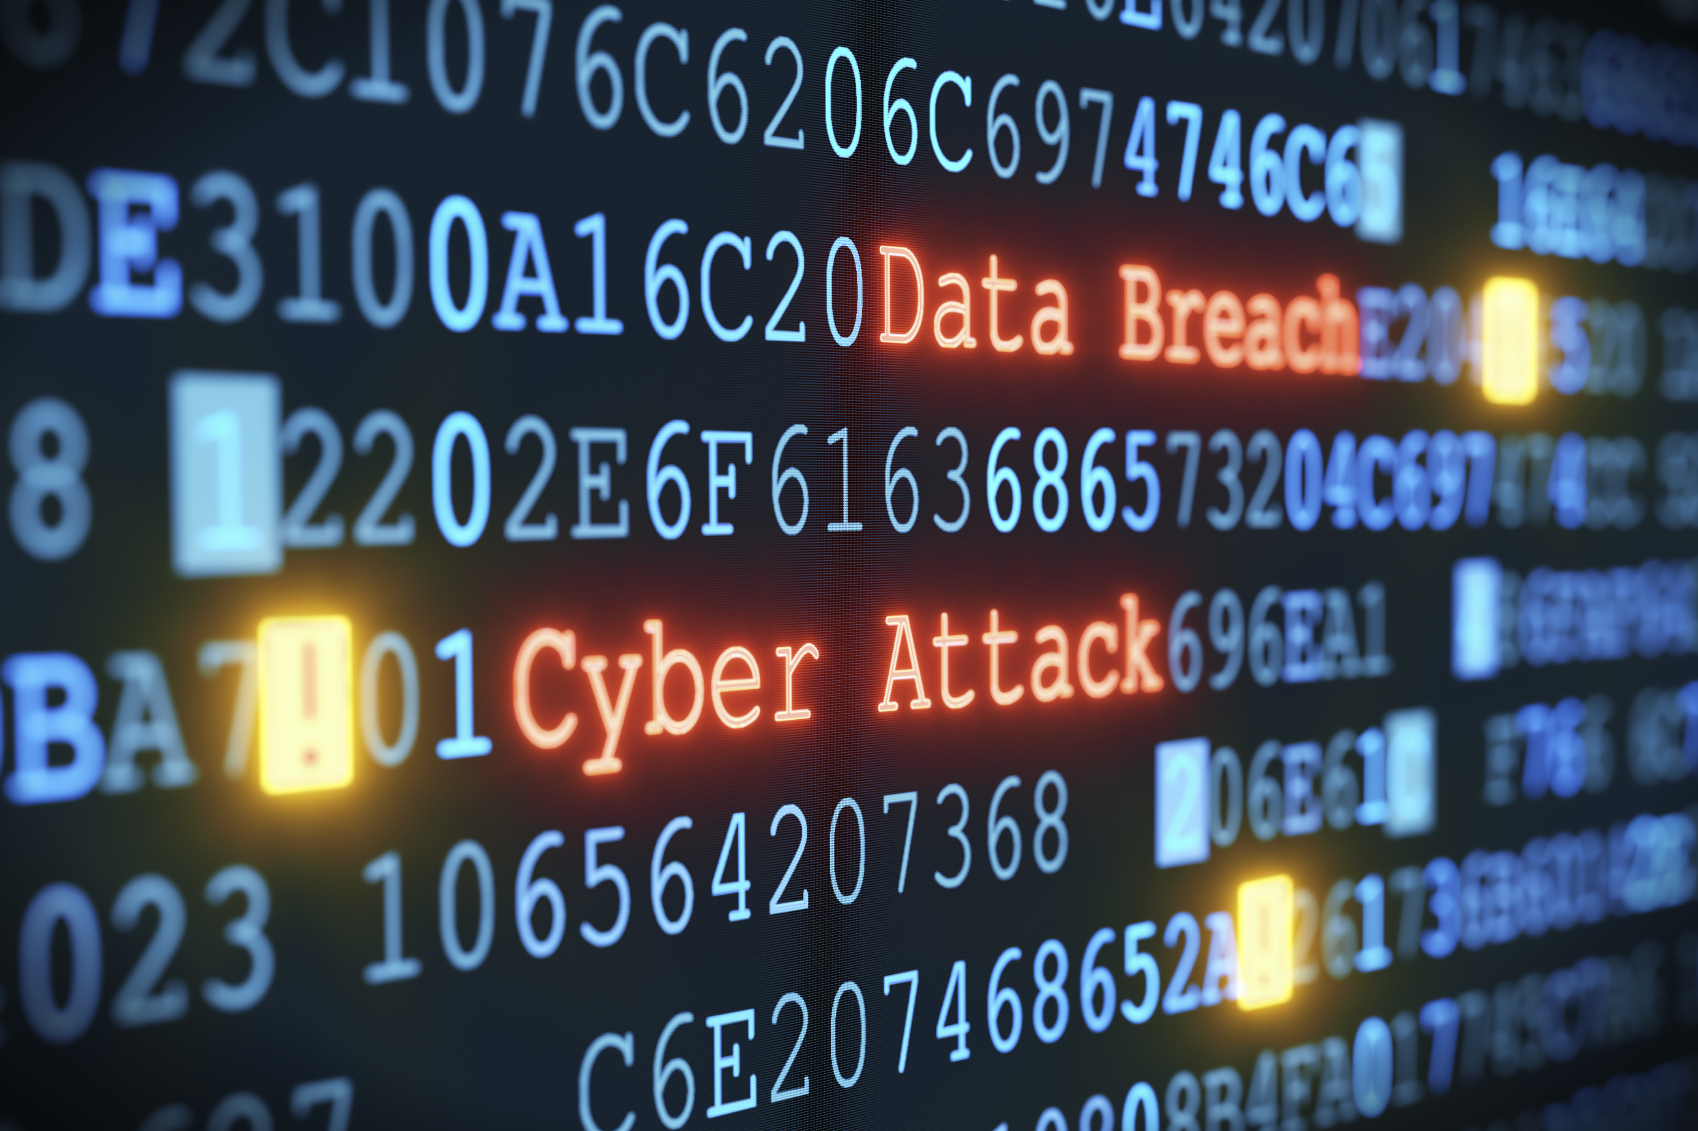 Fileless malware isn't new, but it's becoming an